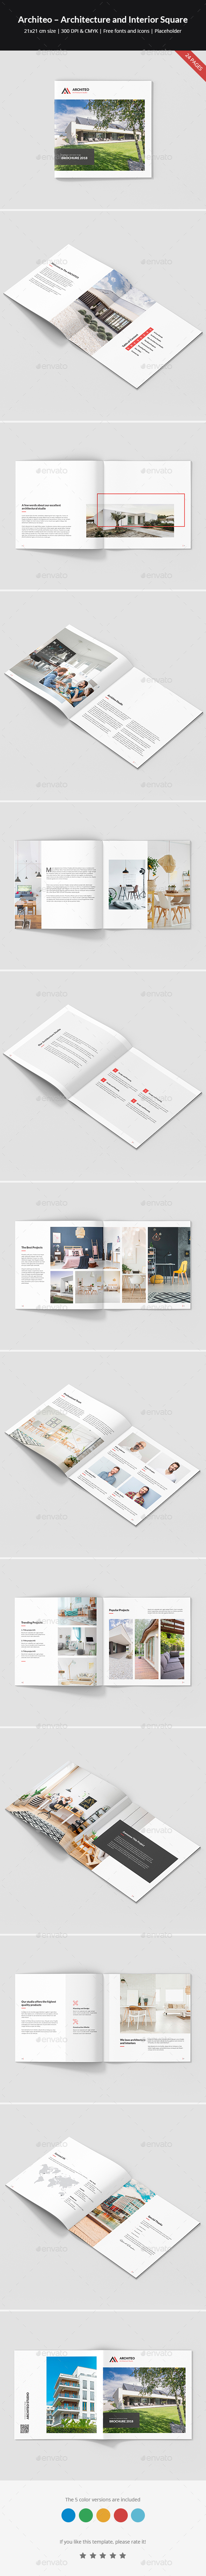 Architeo – Architecture and Interior Brochure Square - Portfolio Brochures